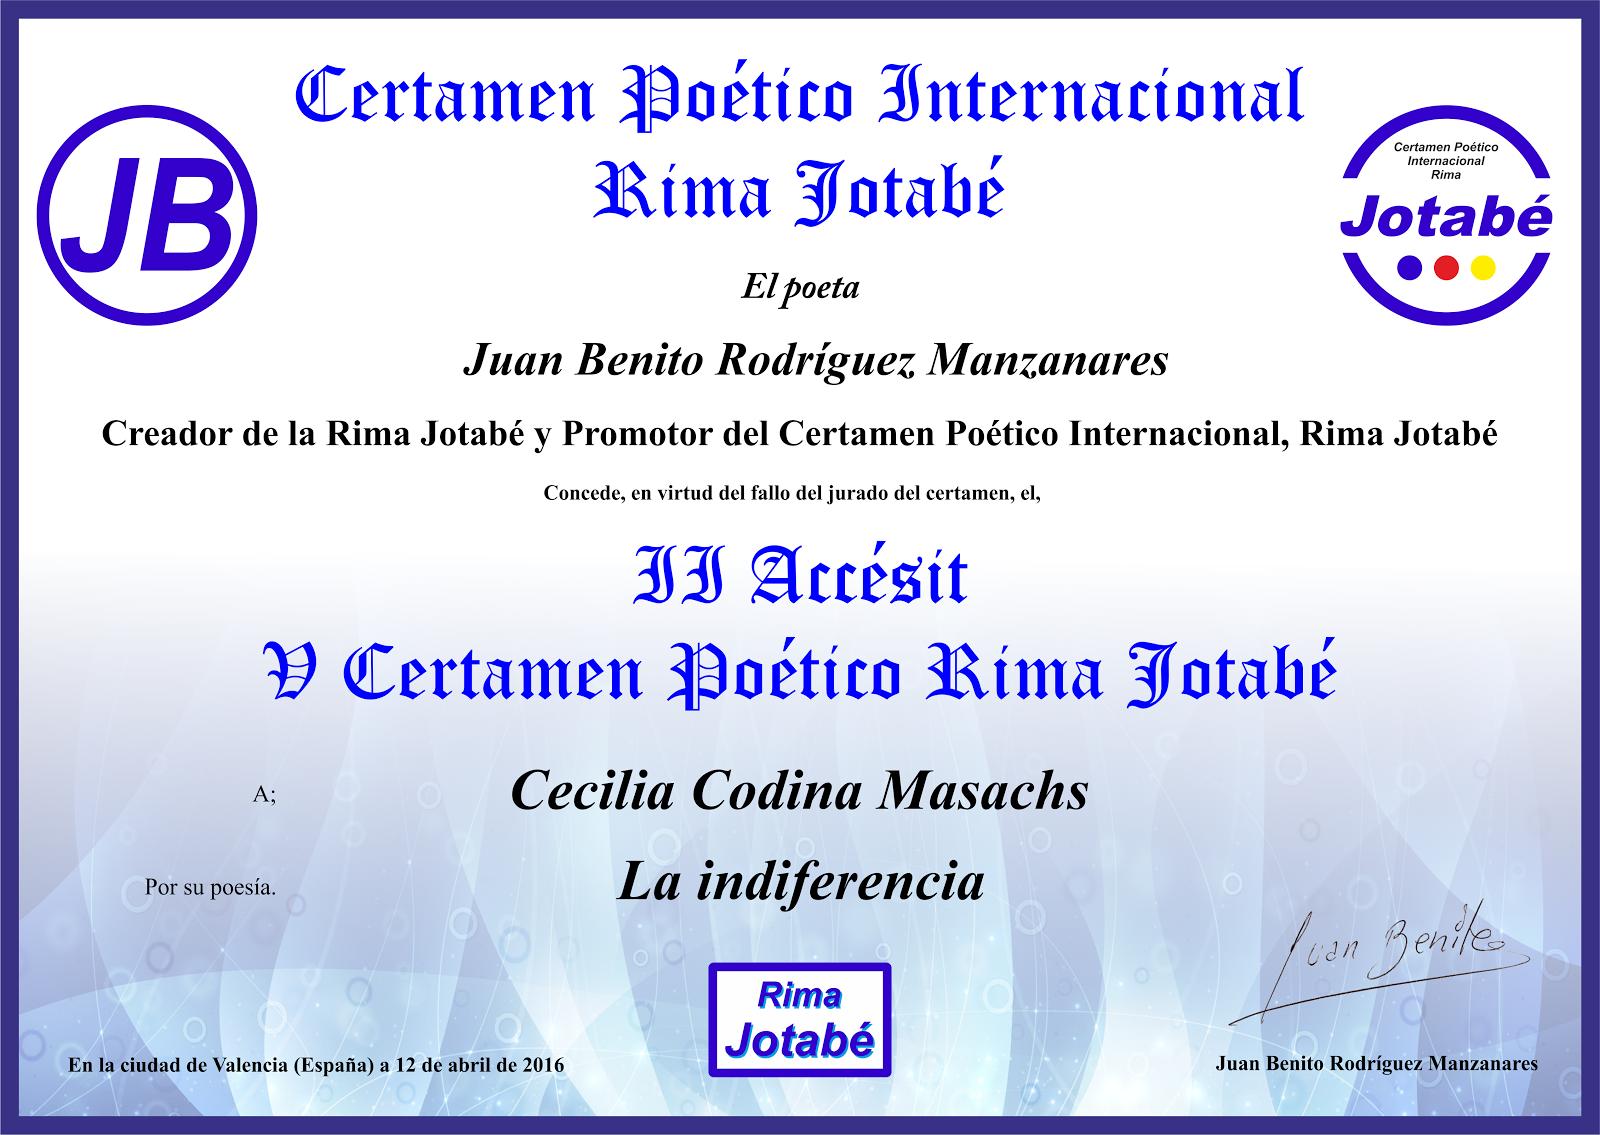 CERTAMEN POÉTICO INTERNACIONAL RIMA JOTABÉ